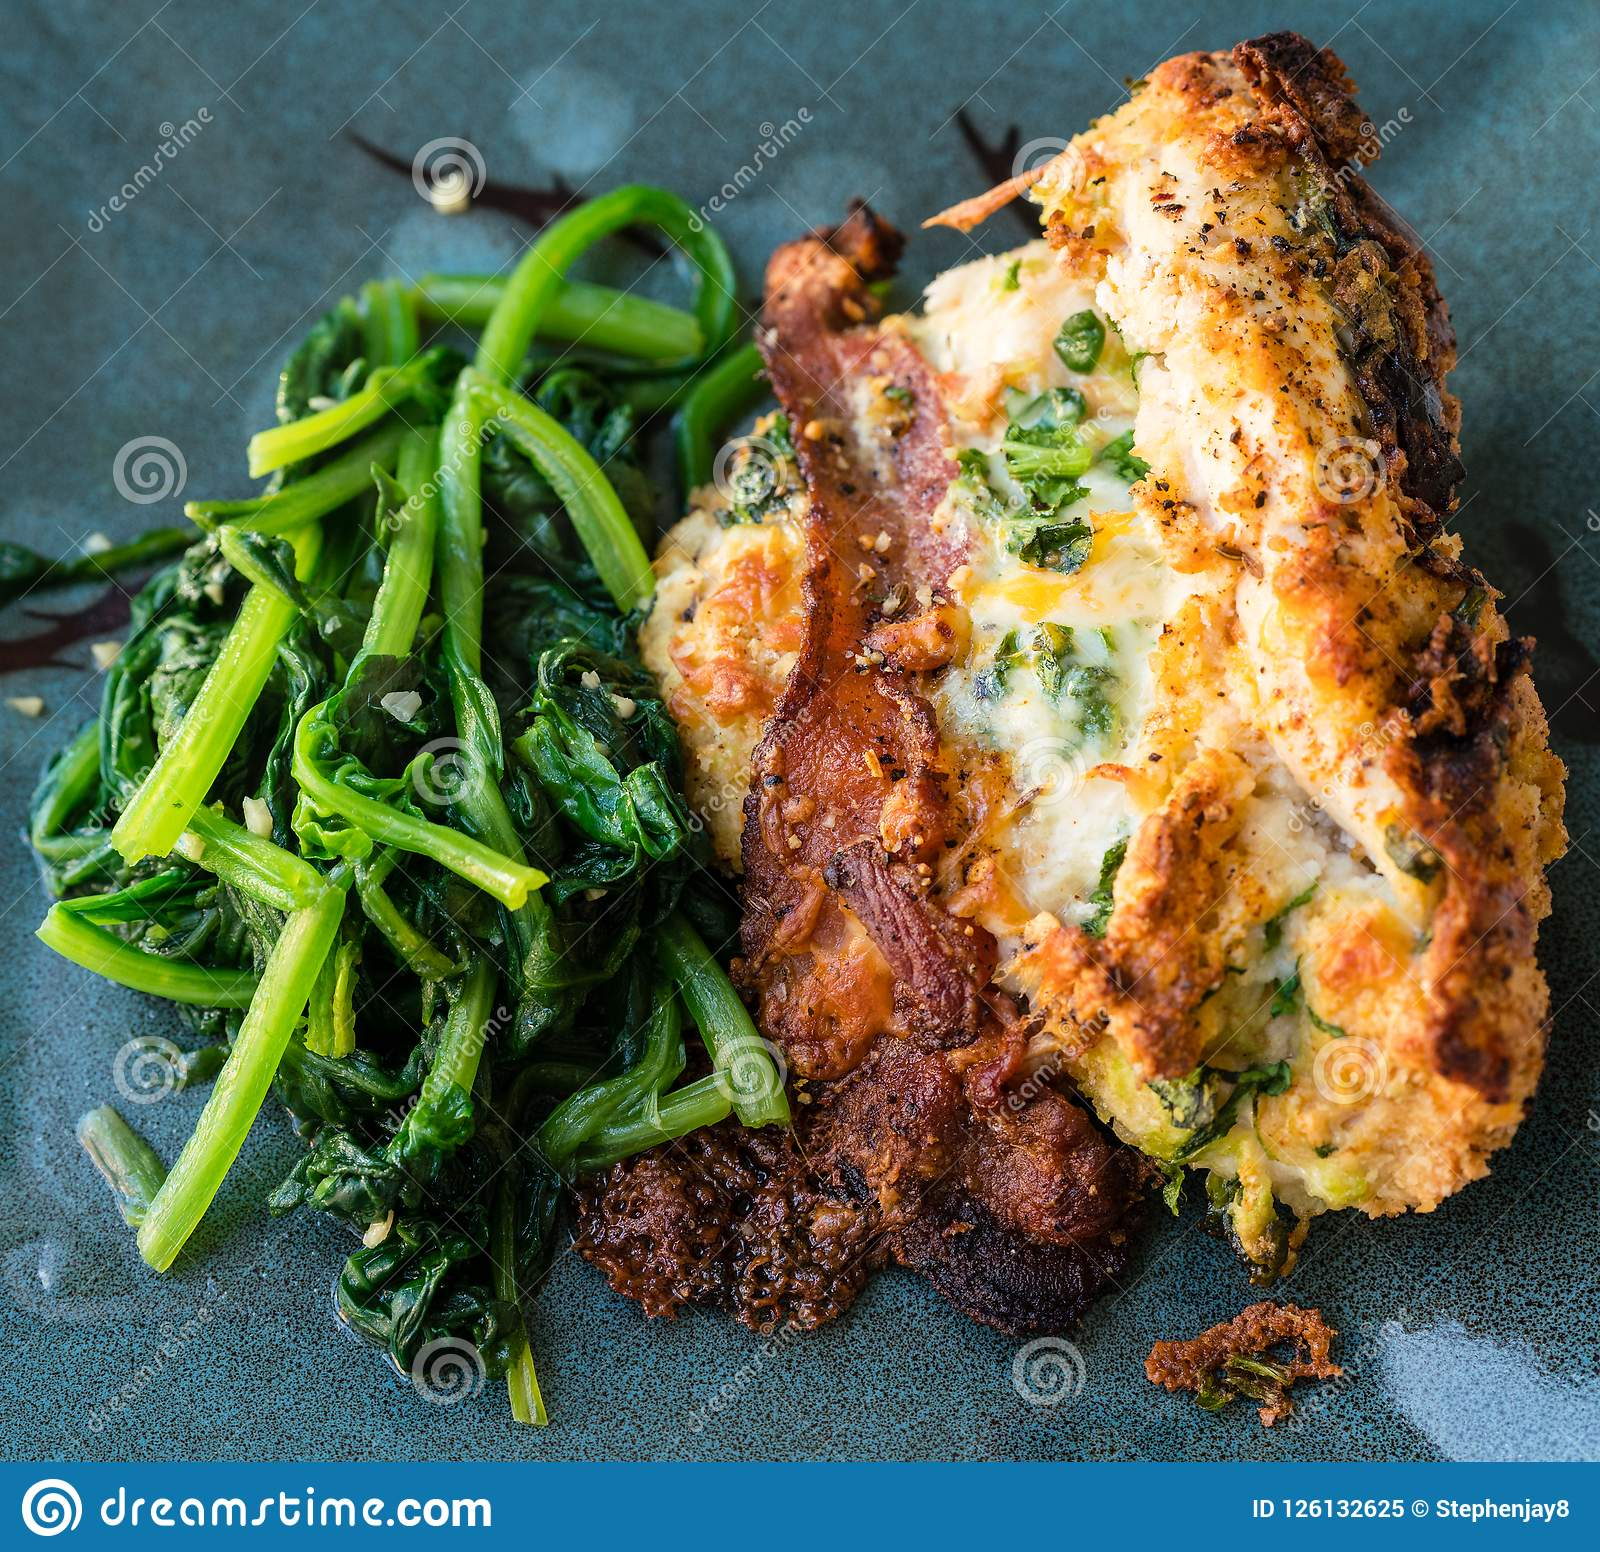 Chicken Cordon Bleu Stock Image Image Of Blue Chickencordonbleu 126132625